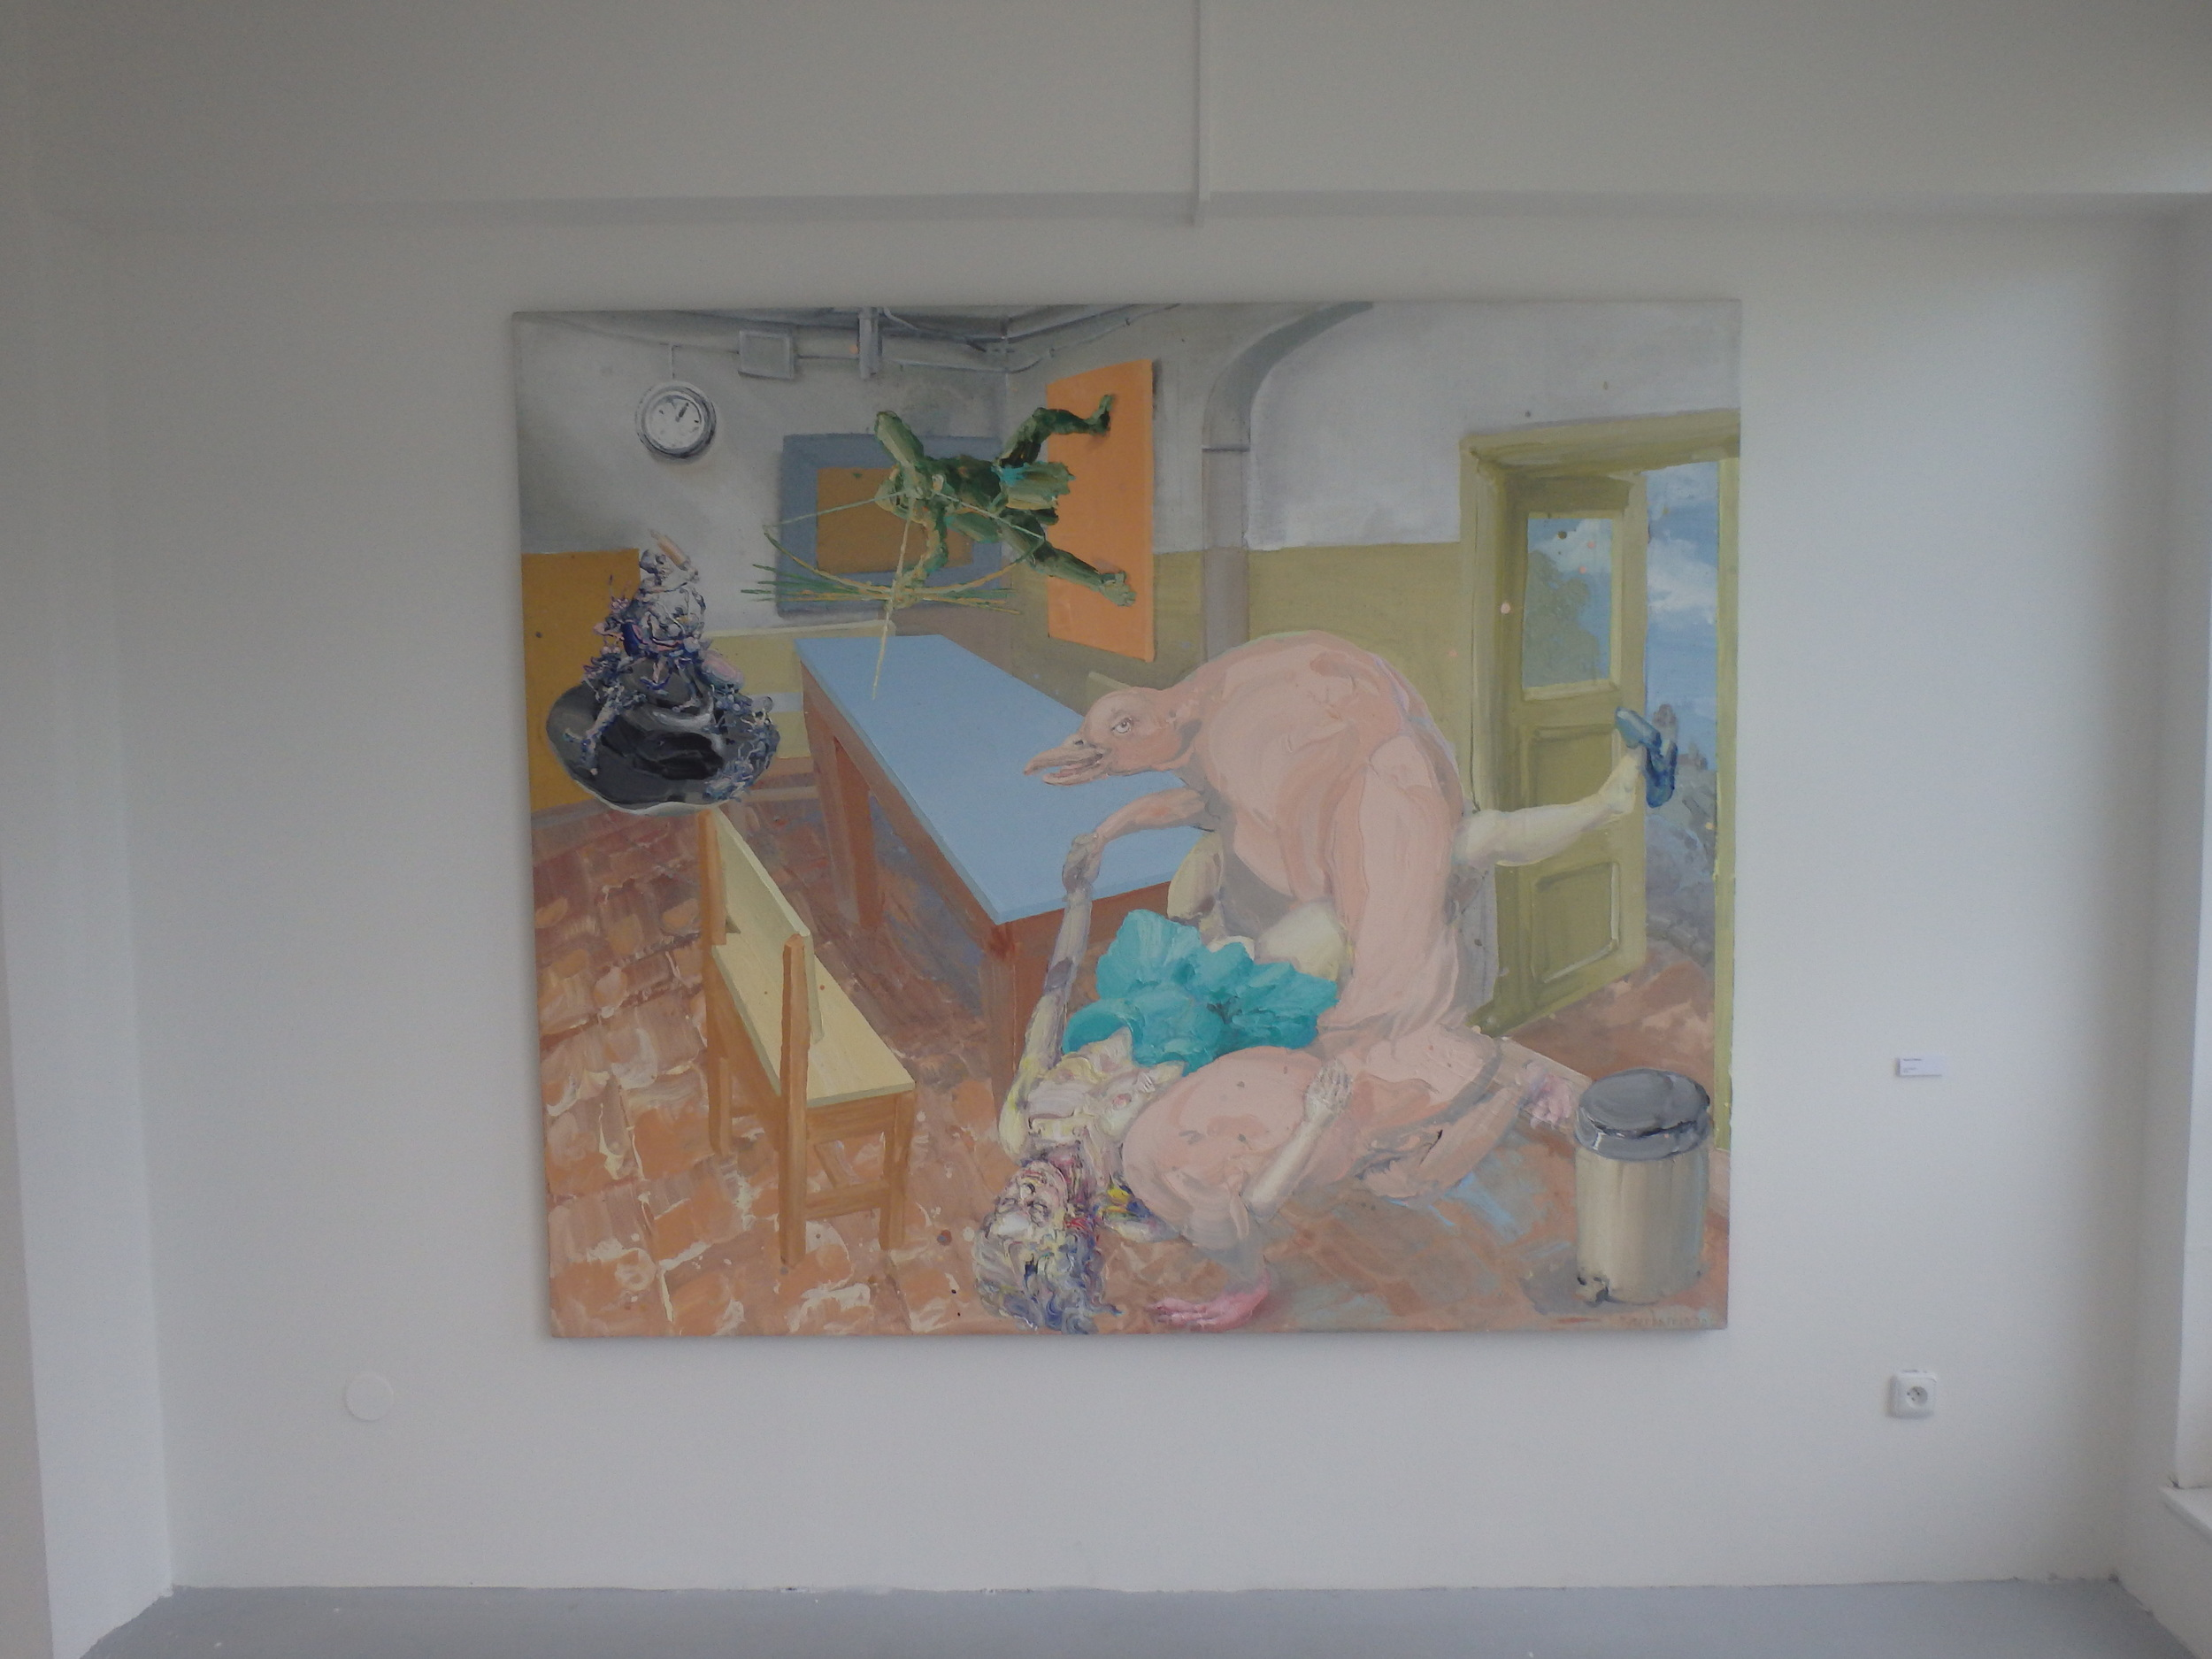 Michael Rittstein, Lysý Pinguin, 2012, plátno, akryl, 180 x 210 cm